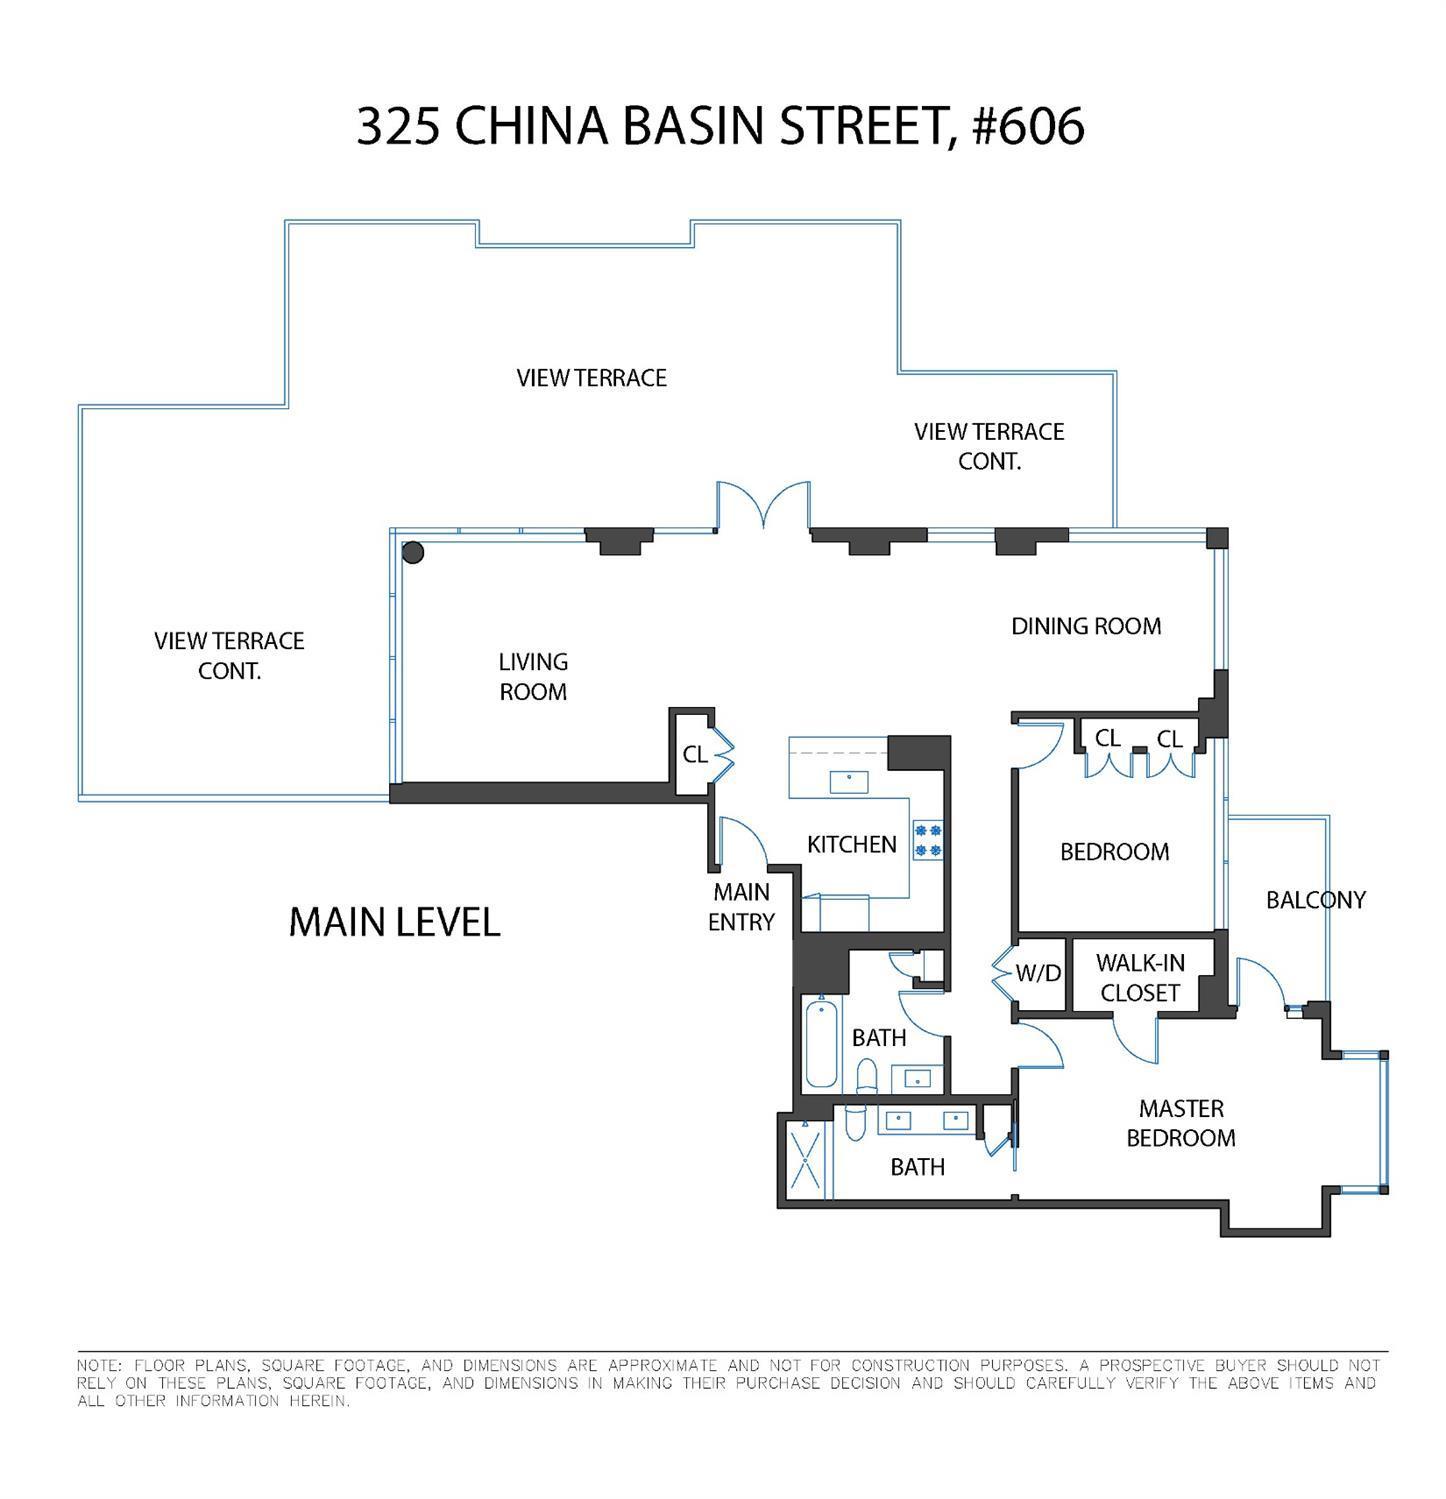 325 China Basin Street #606, San Francisco, CA, 94158